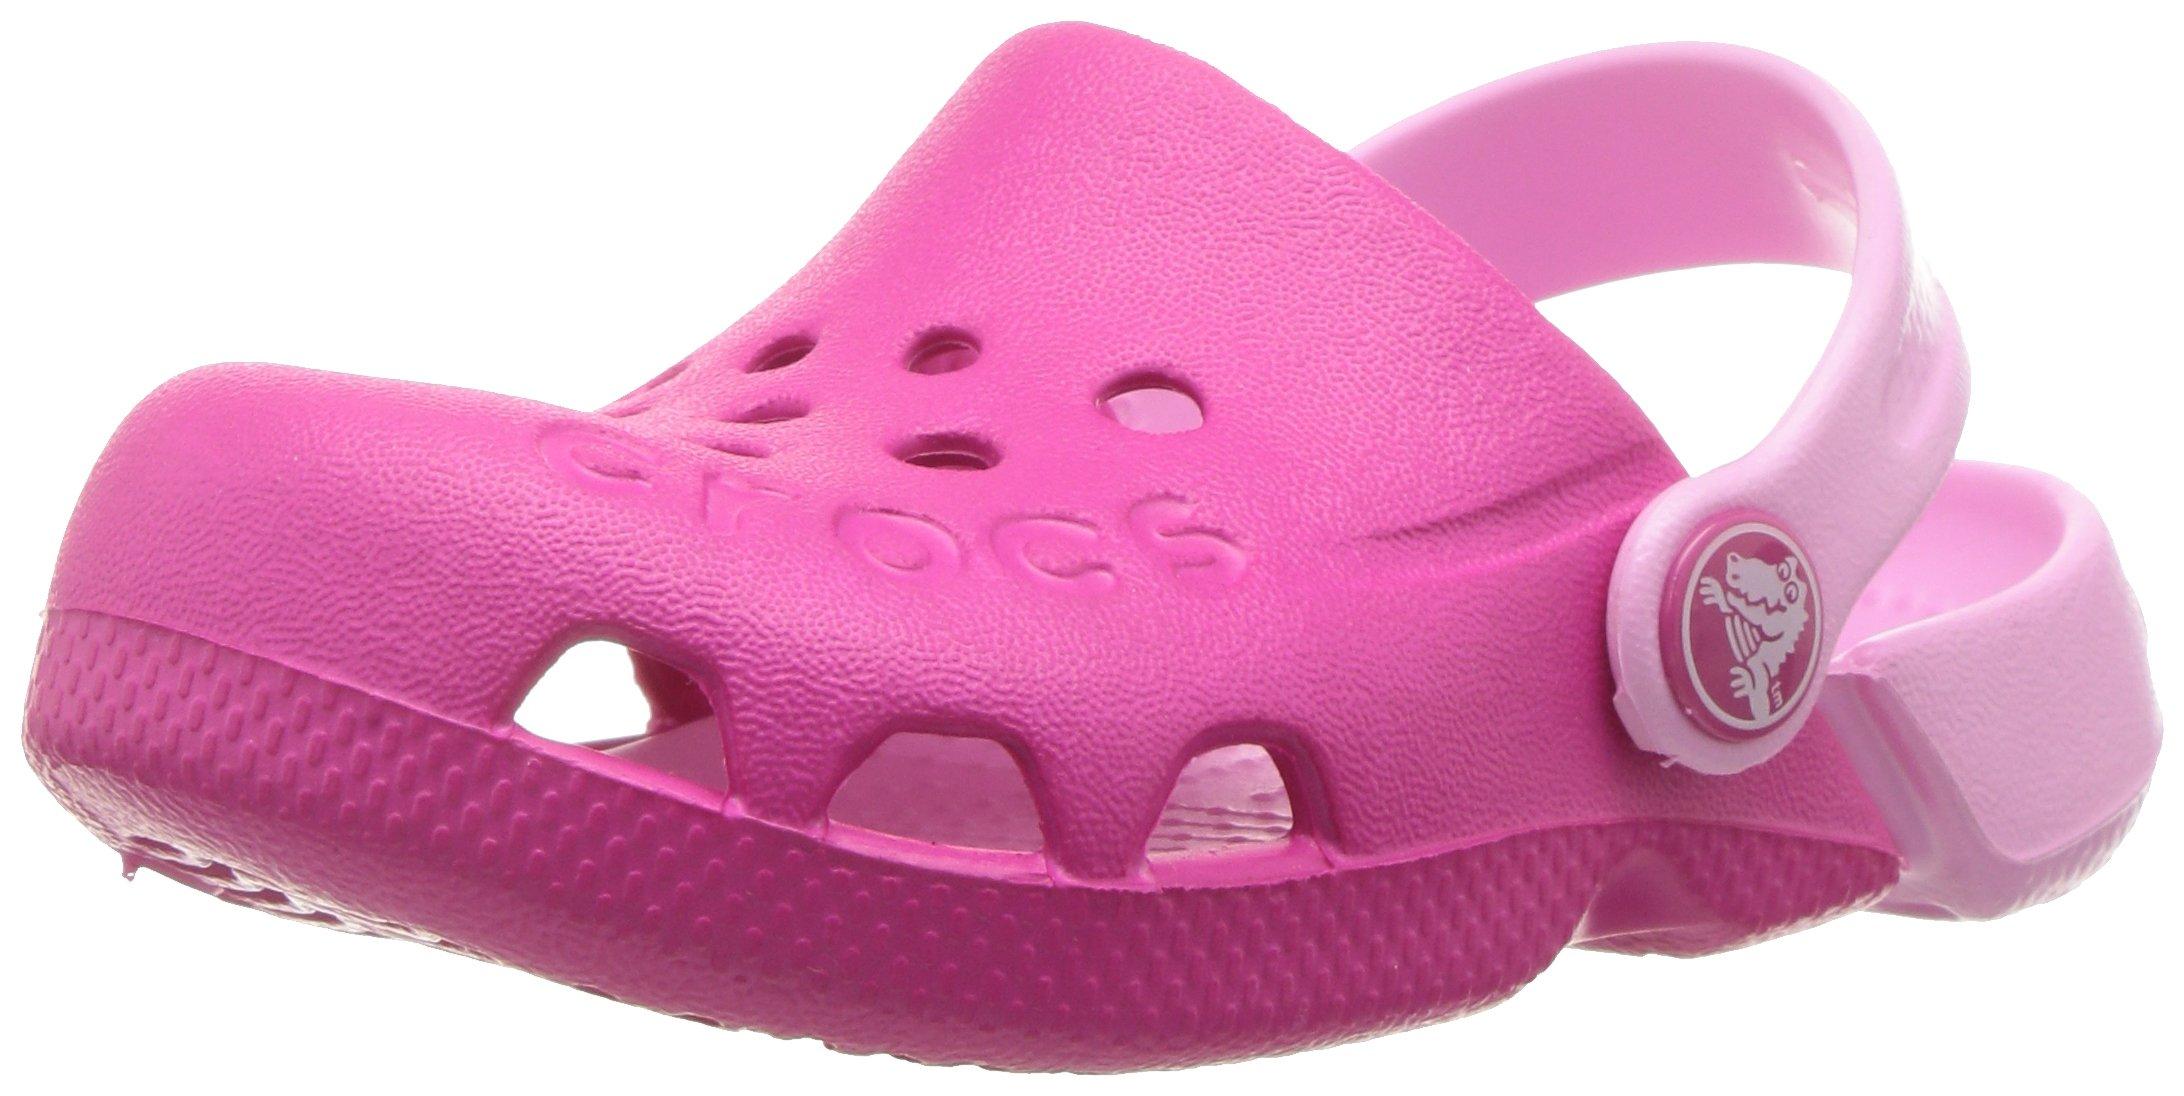 Crocs Unisex-Kids Electro Clog, Candy Pink/Carnation, 11 M US Little Kid